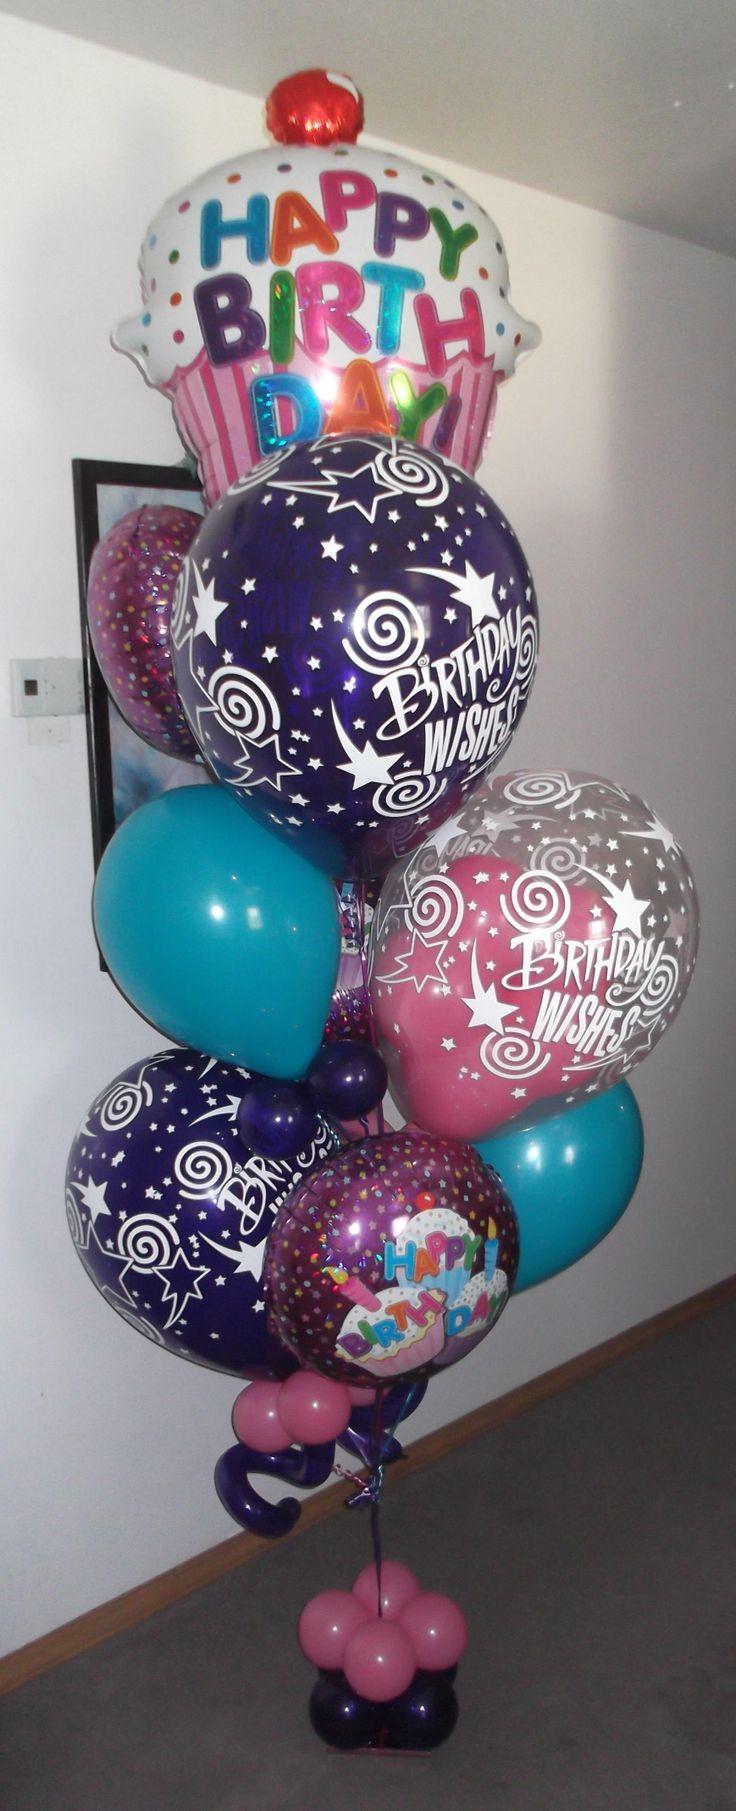 Best helium balloons near me ideas on pinterest diy